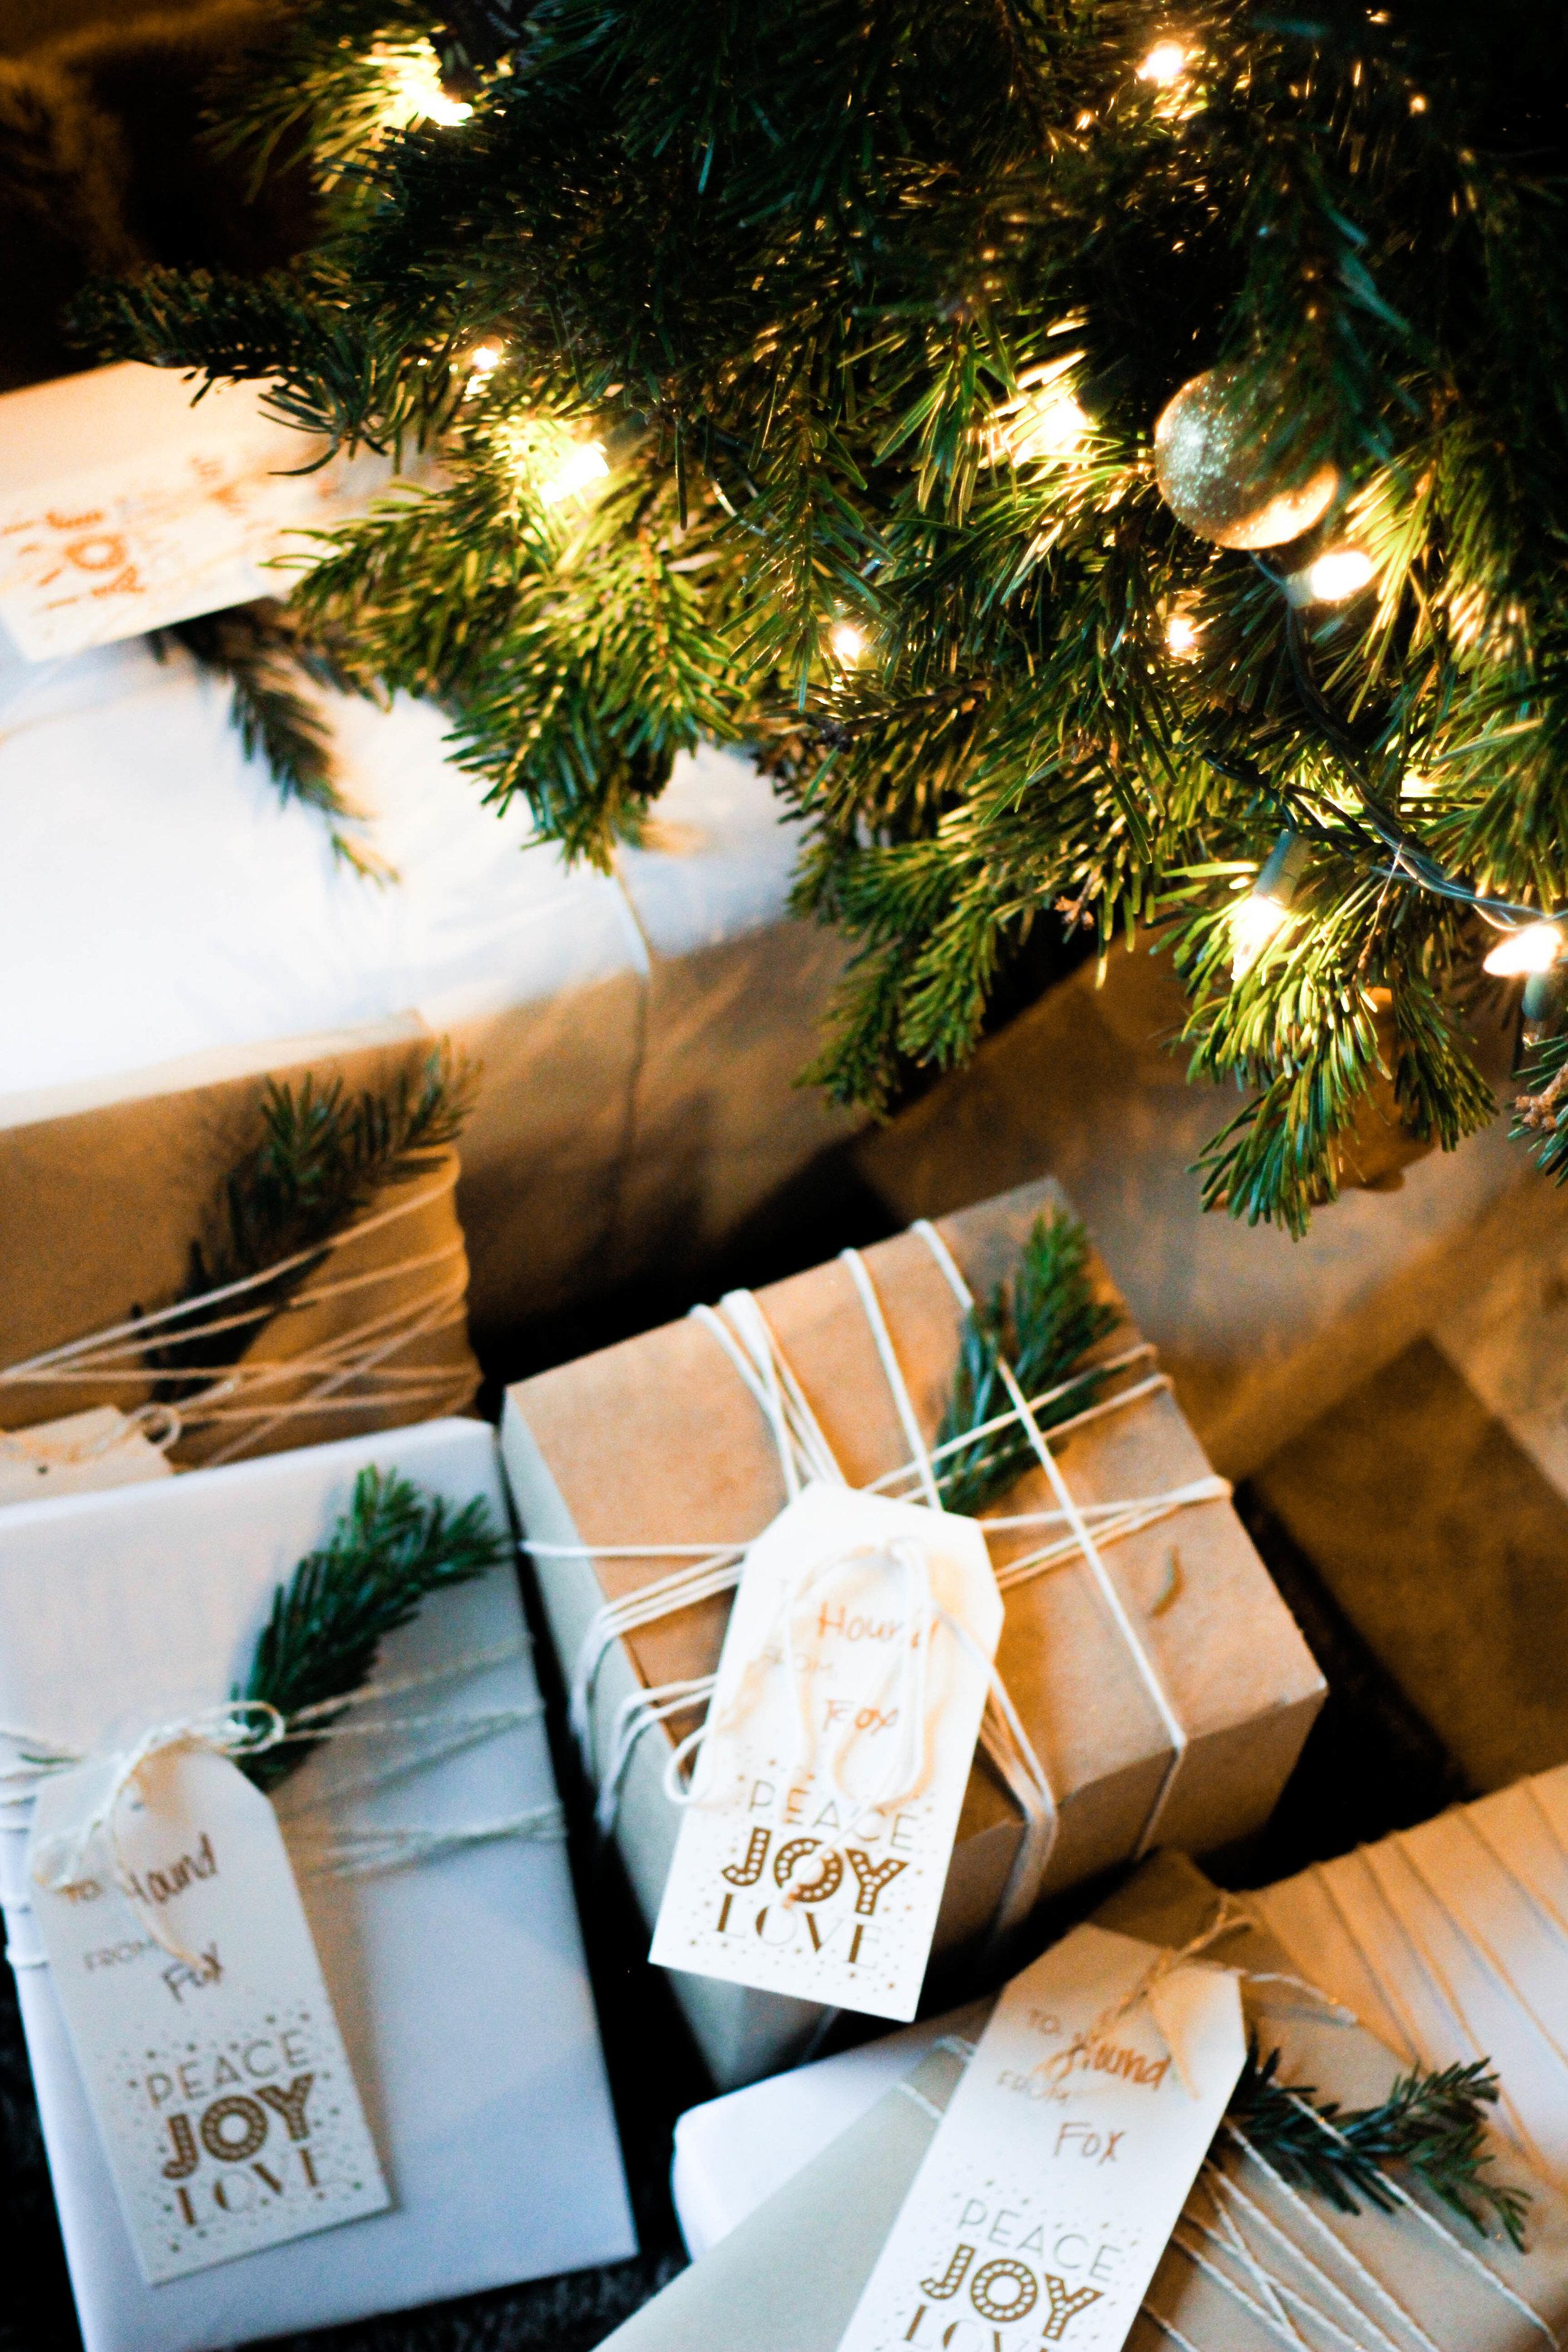 Cyber Monday Health & Wellness Gift Ideas | Jennifer Diaz | Holiday Gift Guide | Wellness Essientials | Workout Essientials | Athleta | Lululemon | Ugg | Nike | Adidas Women | Gifts for Women